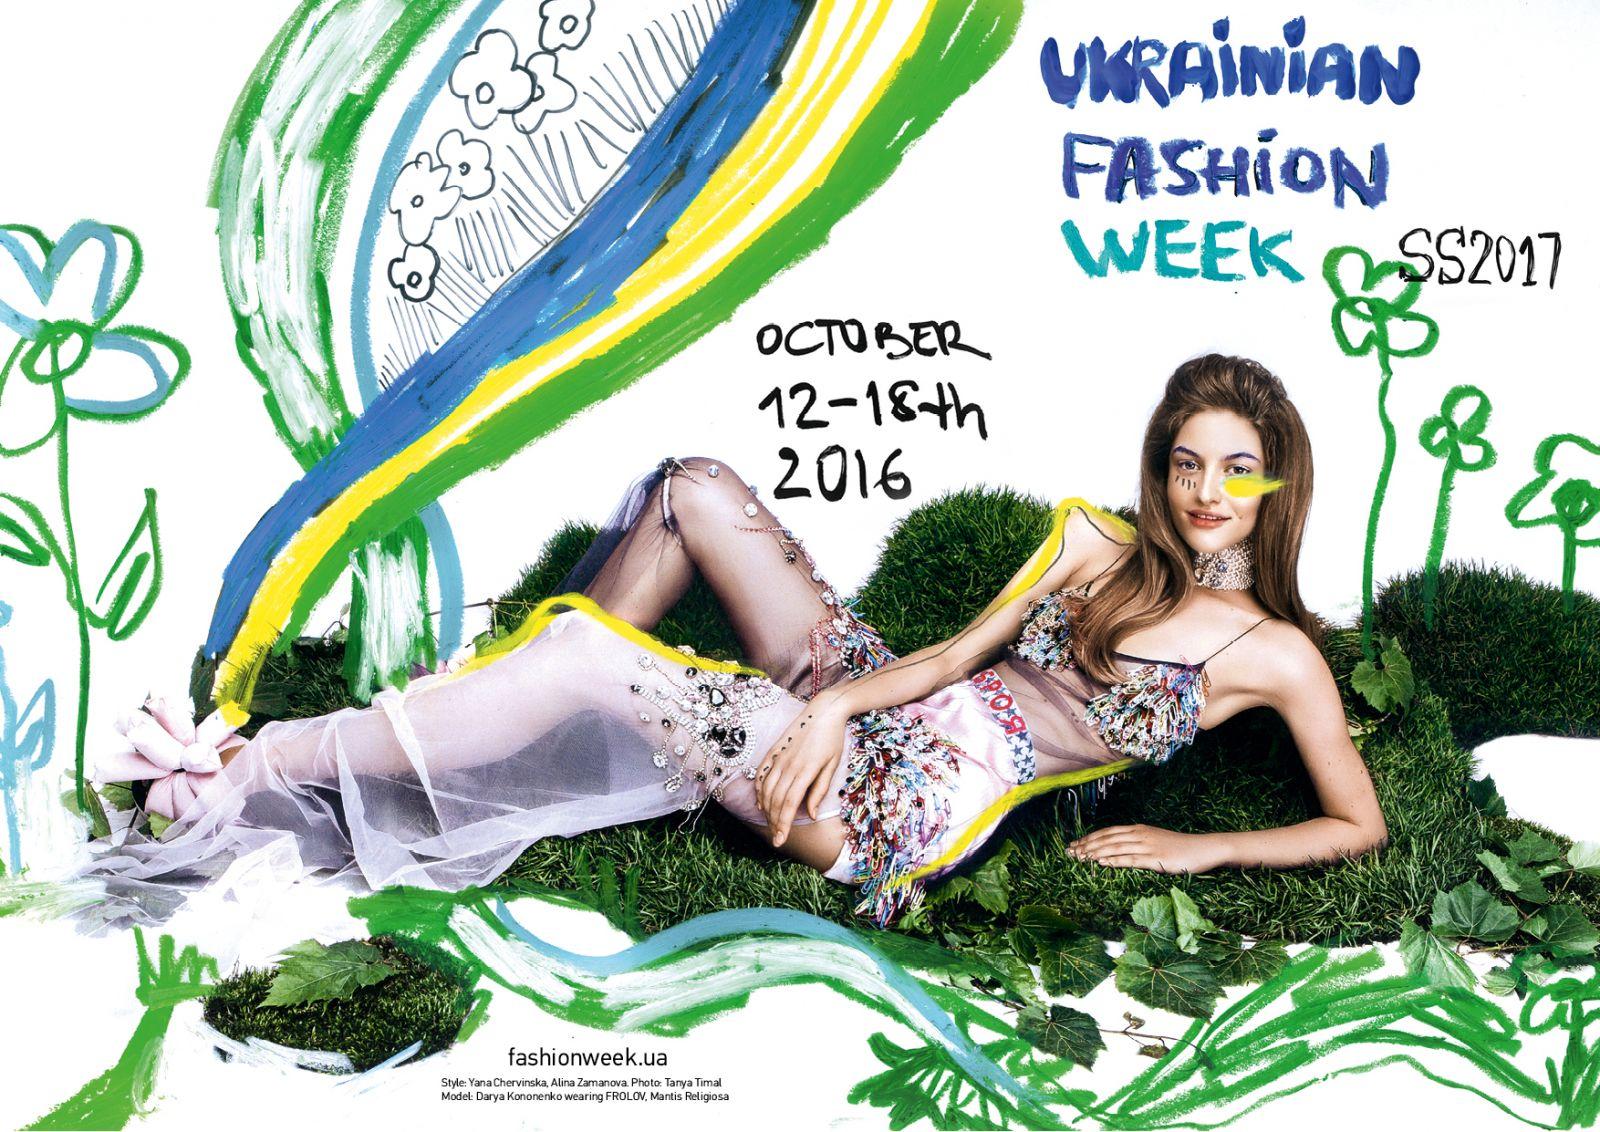 Новый кампейн Ukrainian Fashion Week